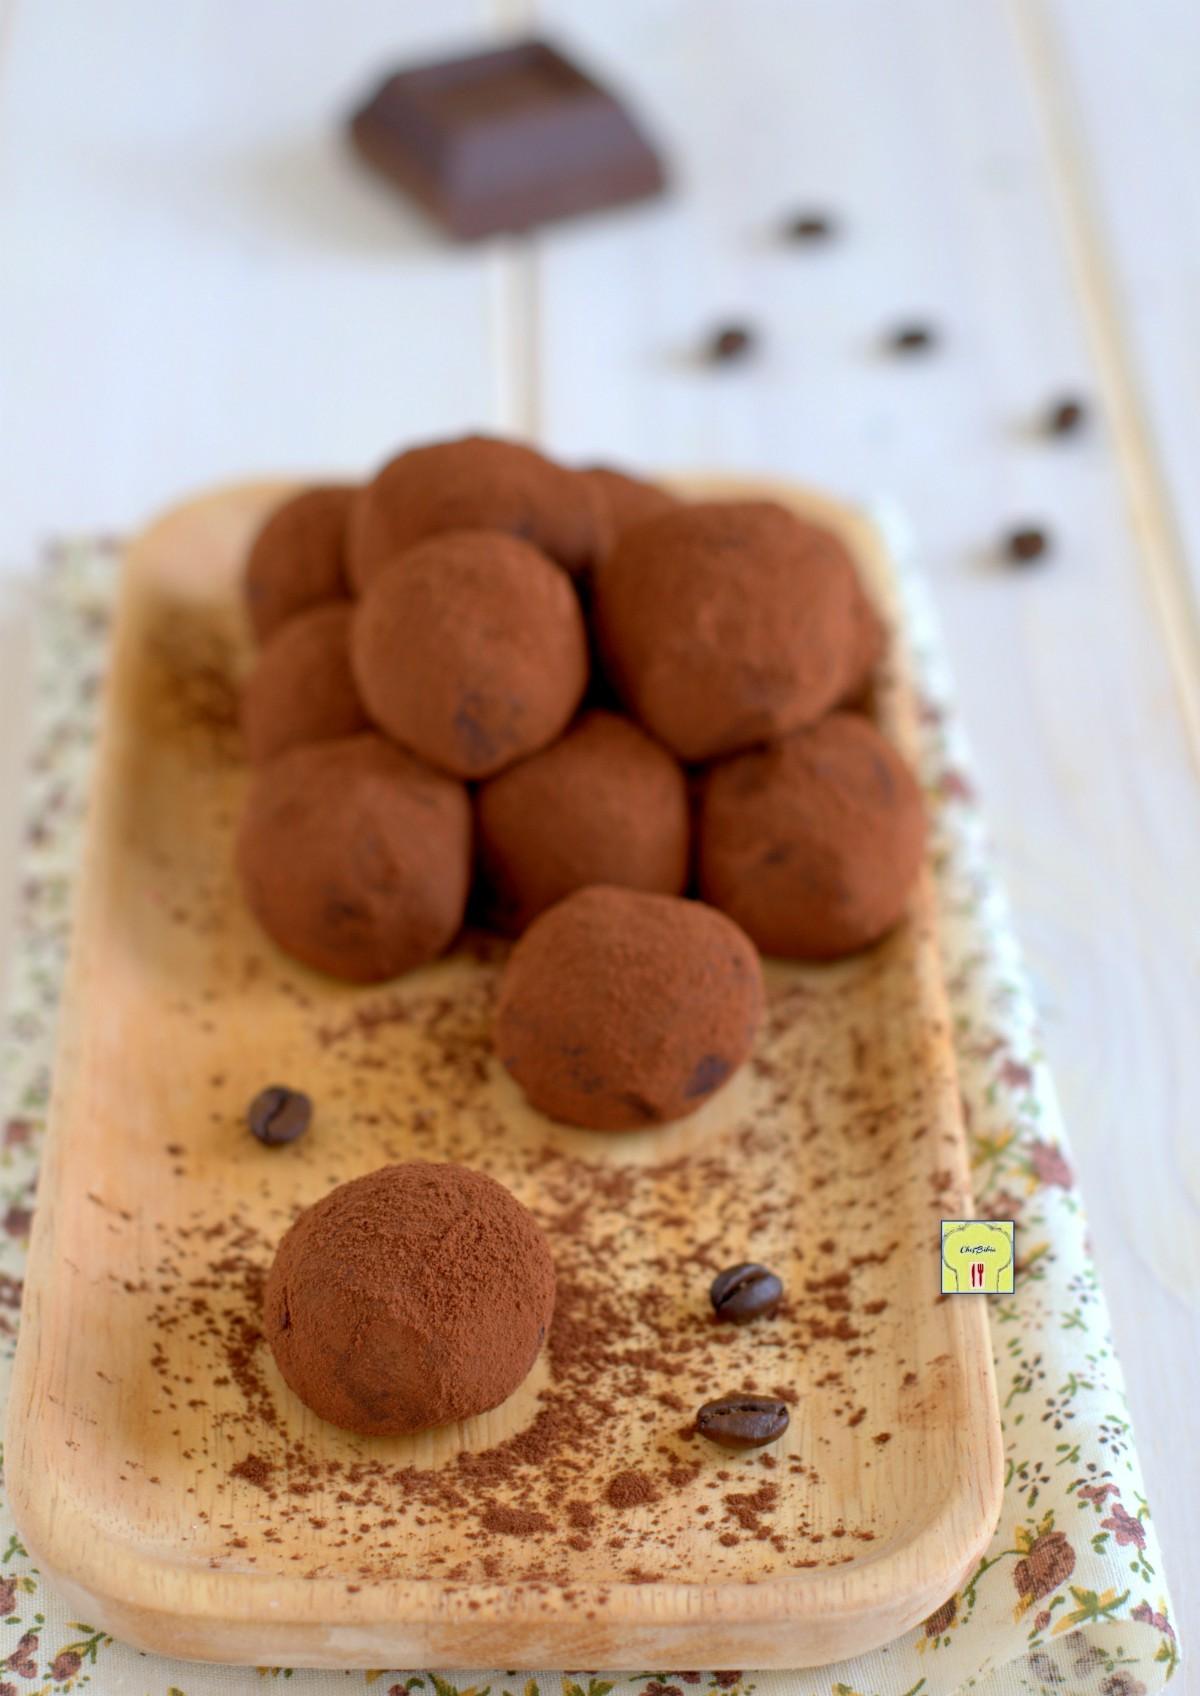 tartufi cioccolato e caffè gp